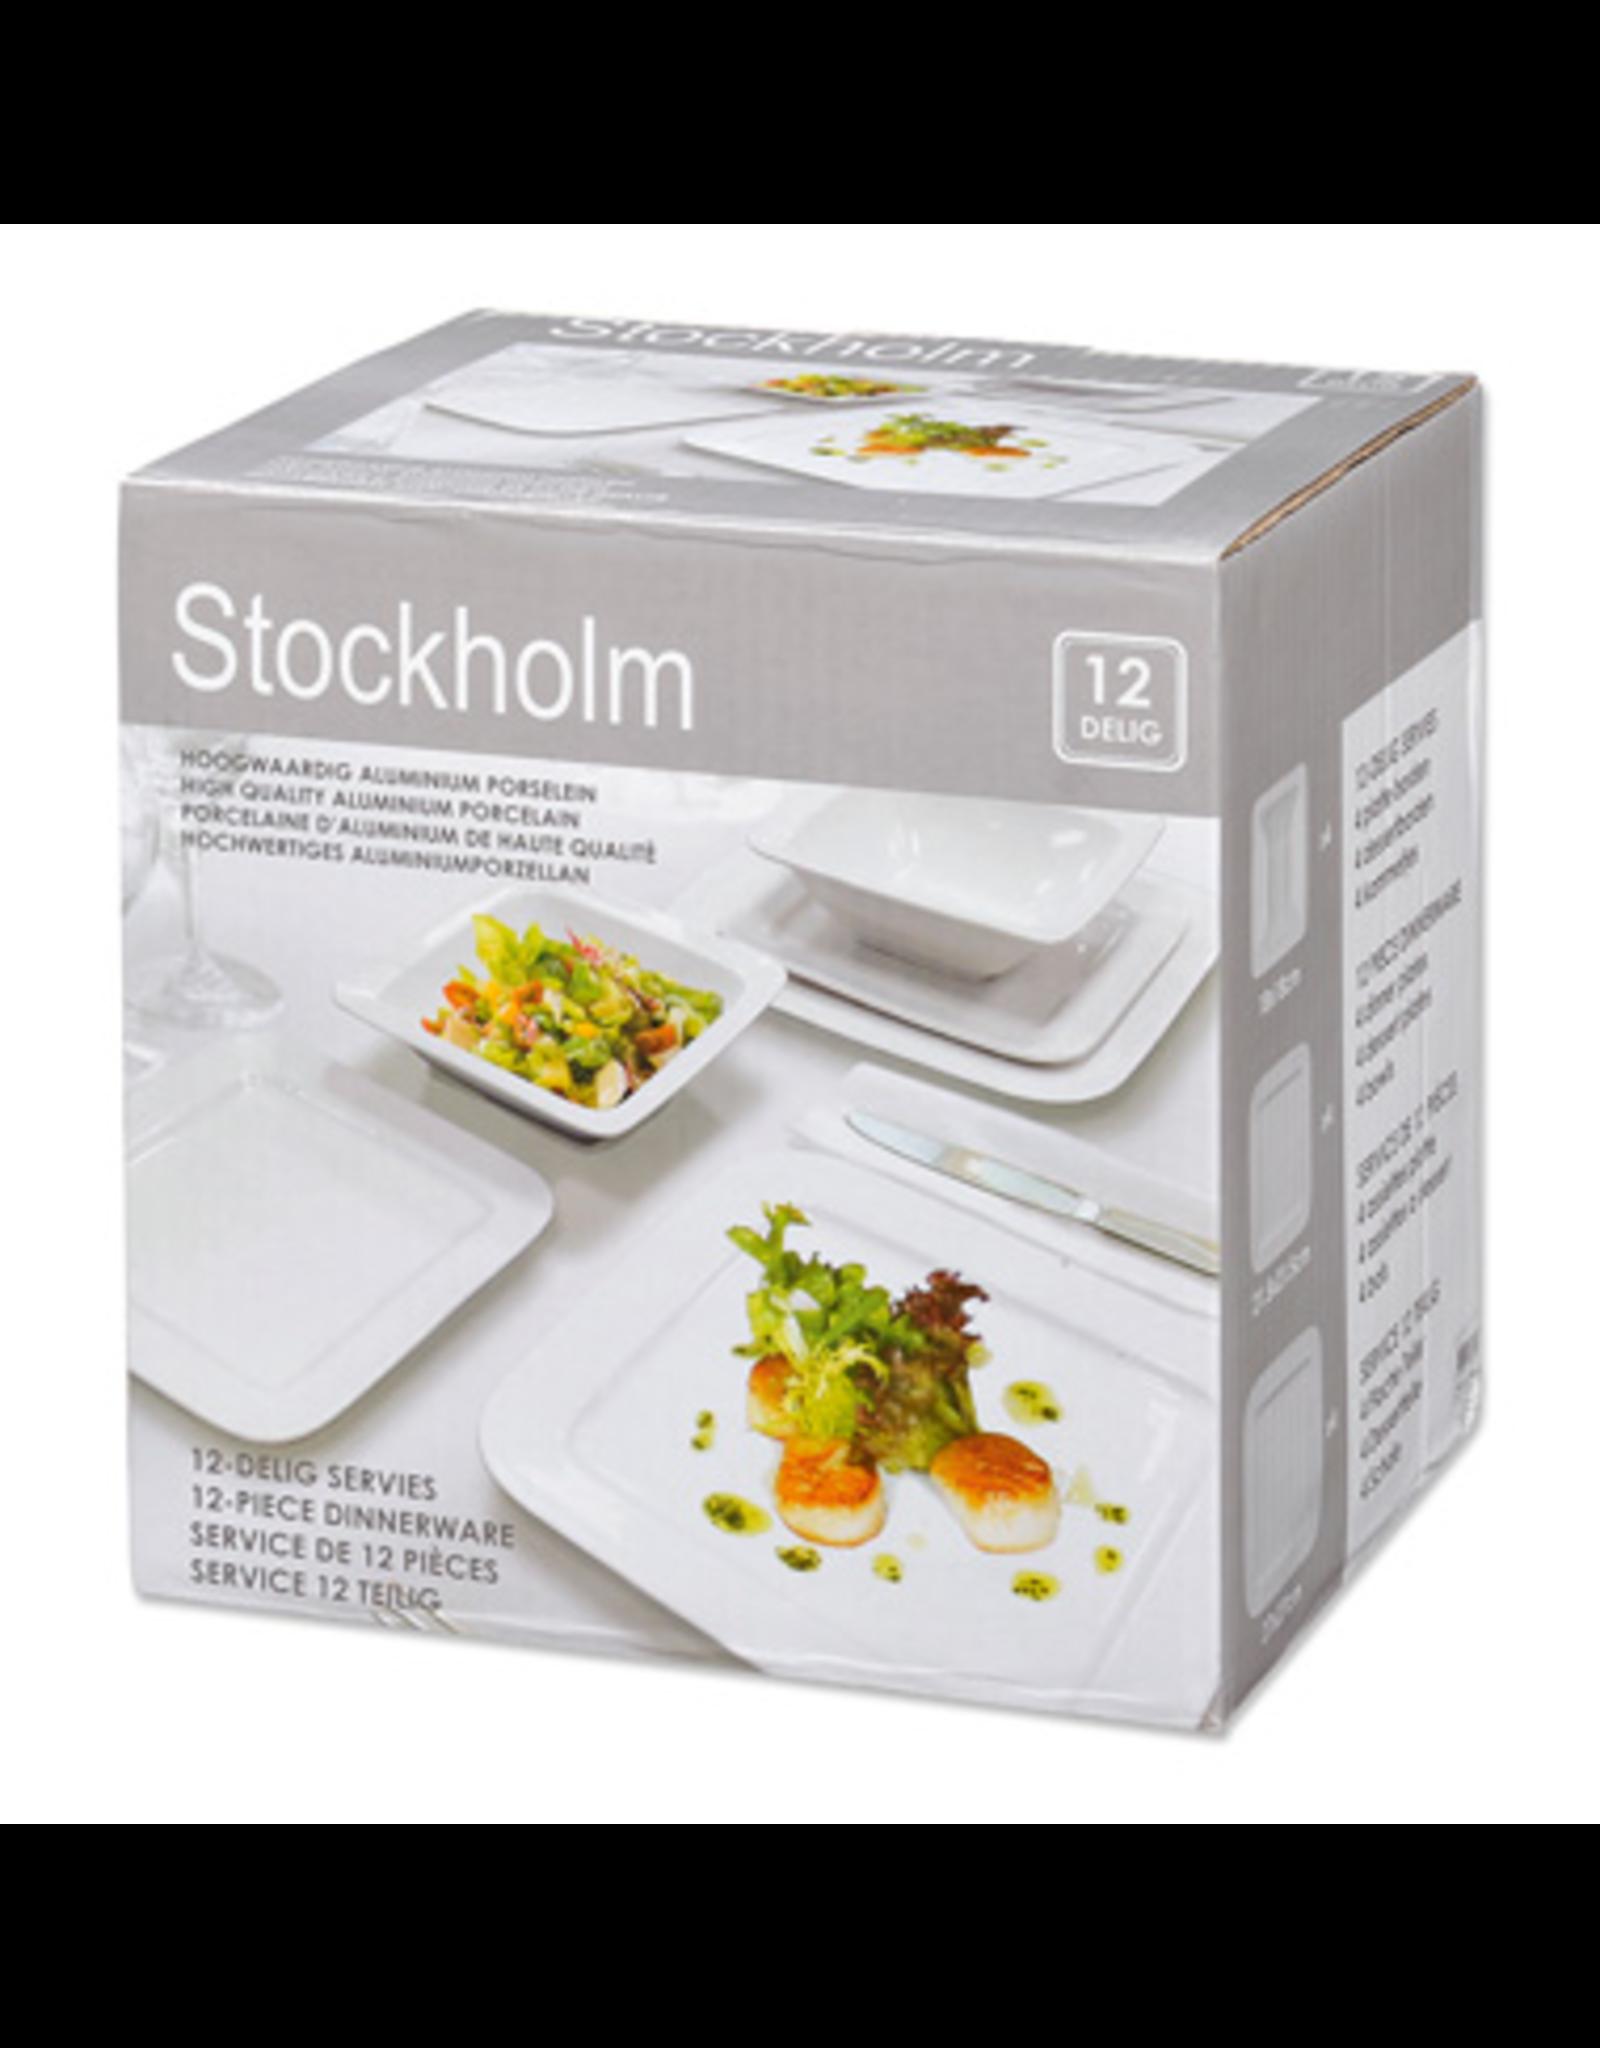 12 DLG SERVIES STOCKHOLM